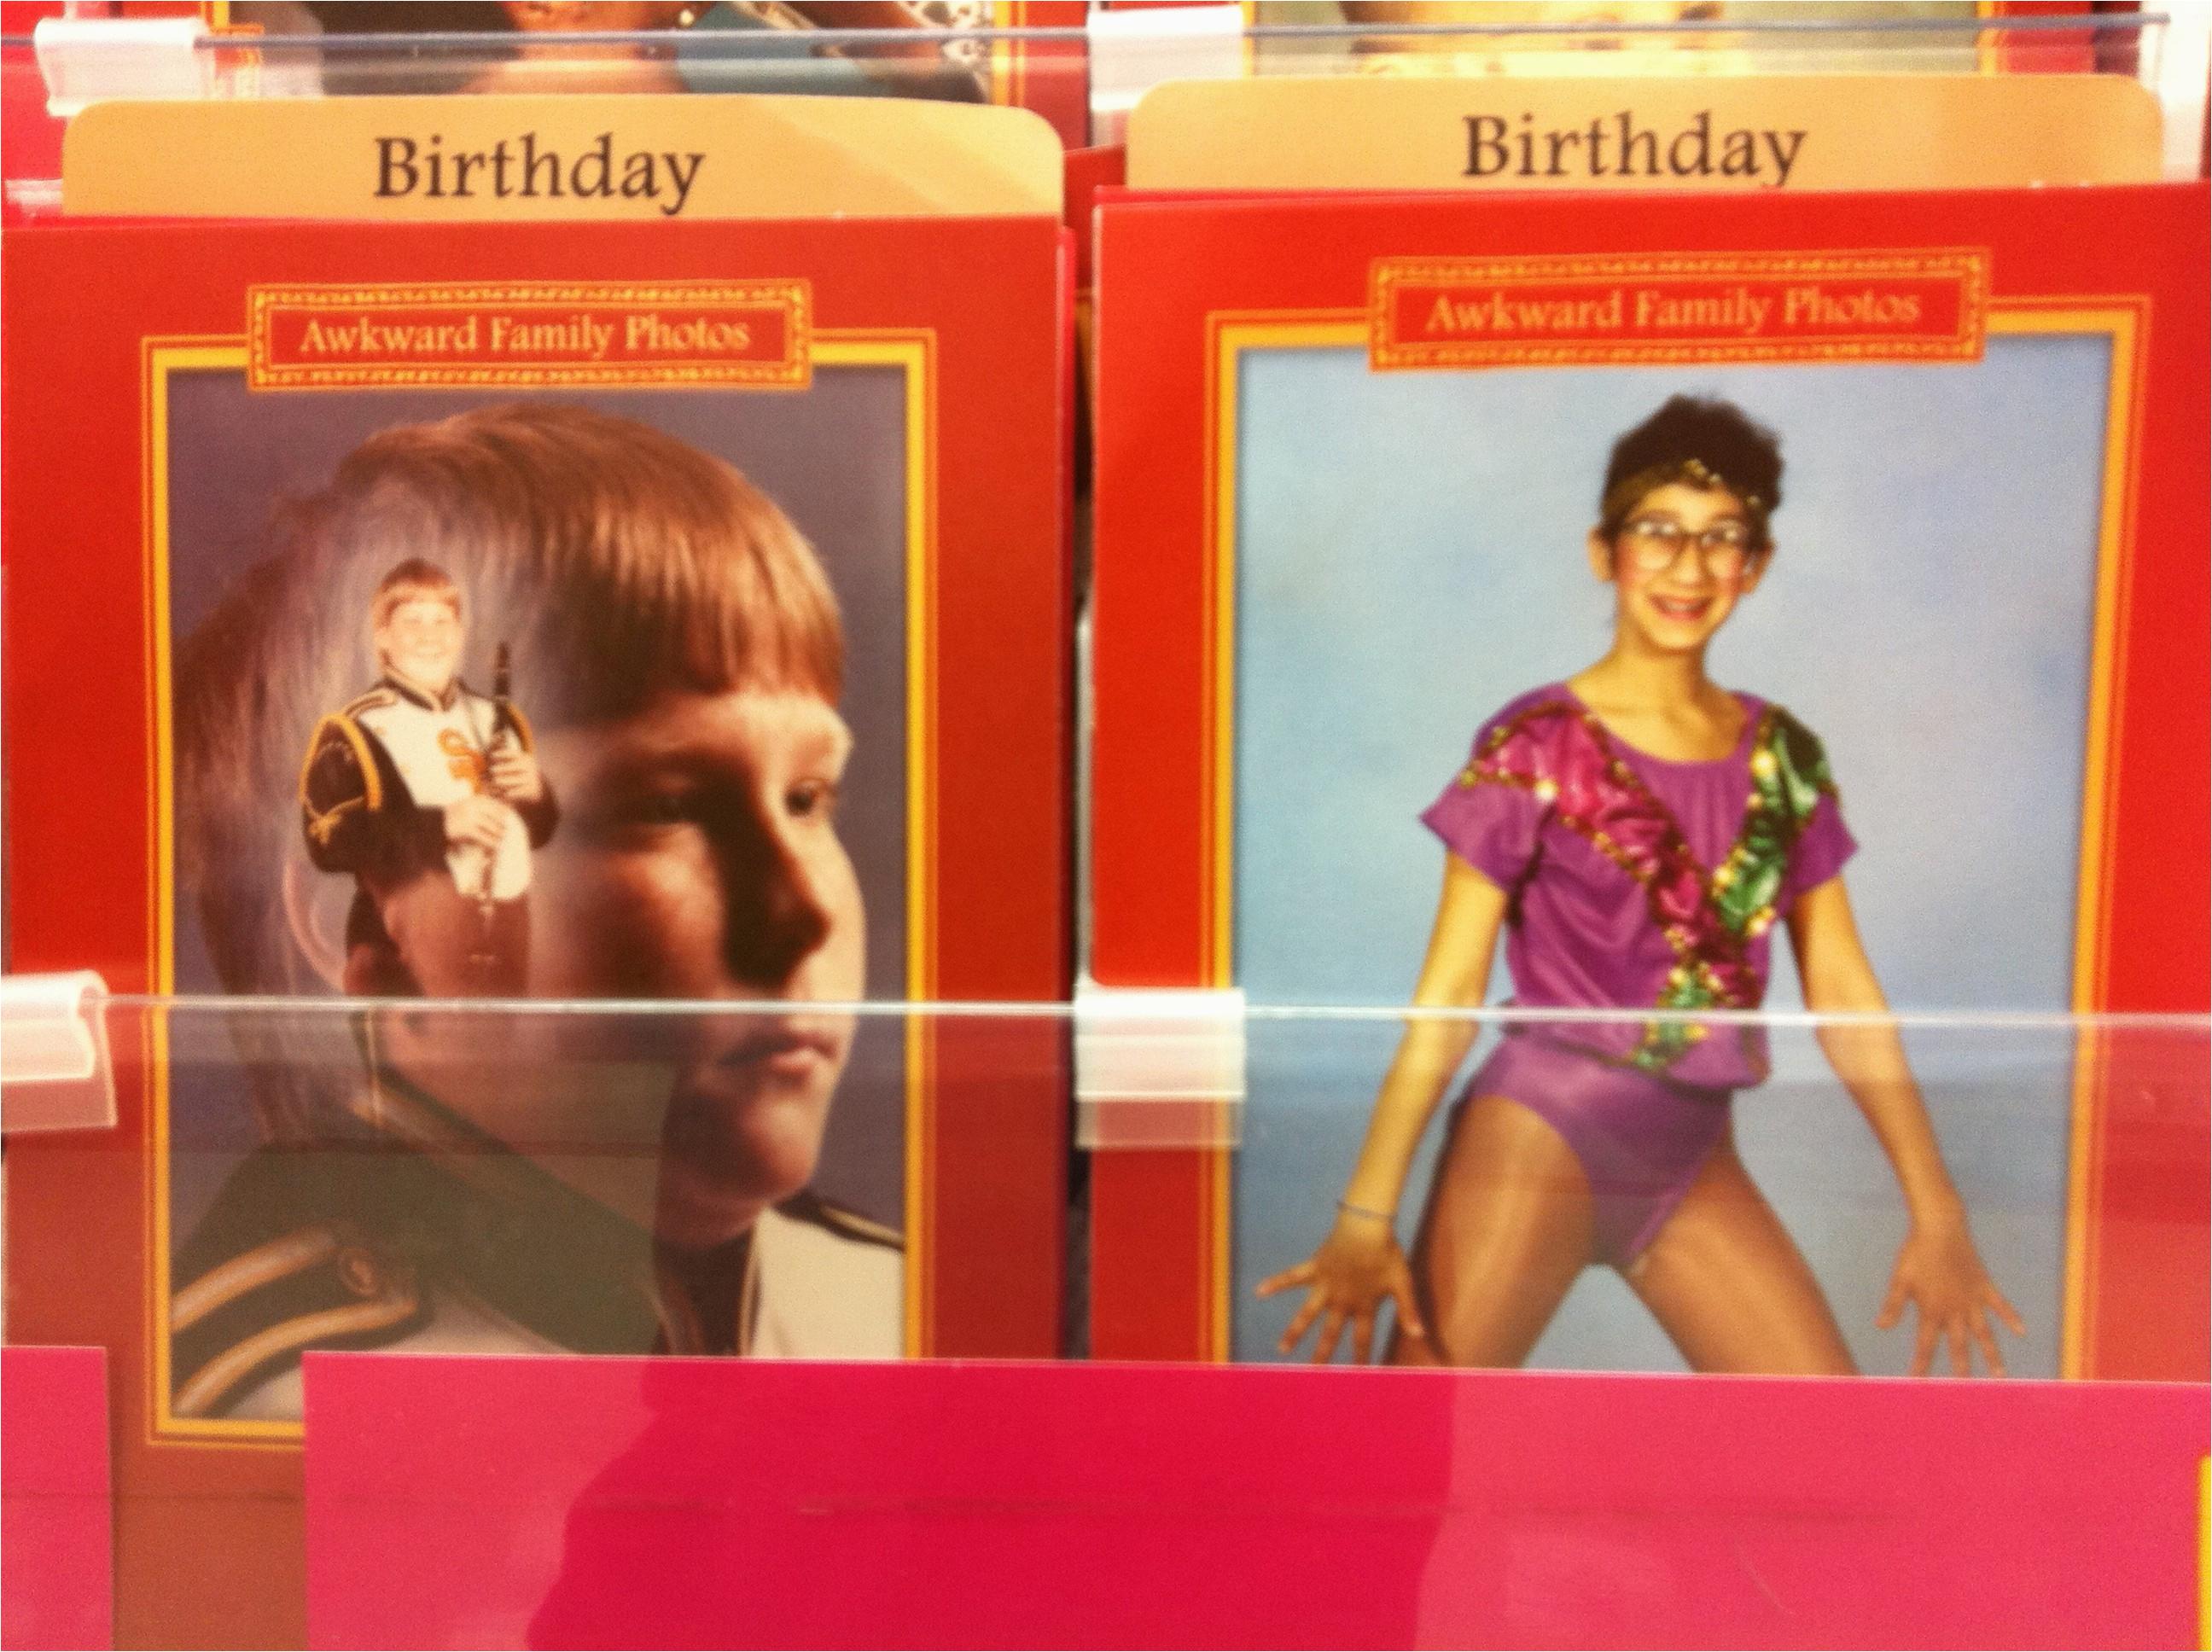 awkward family photos greeting cards